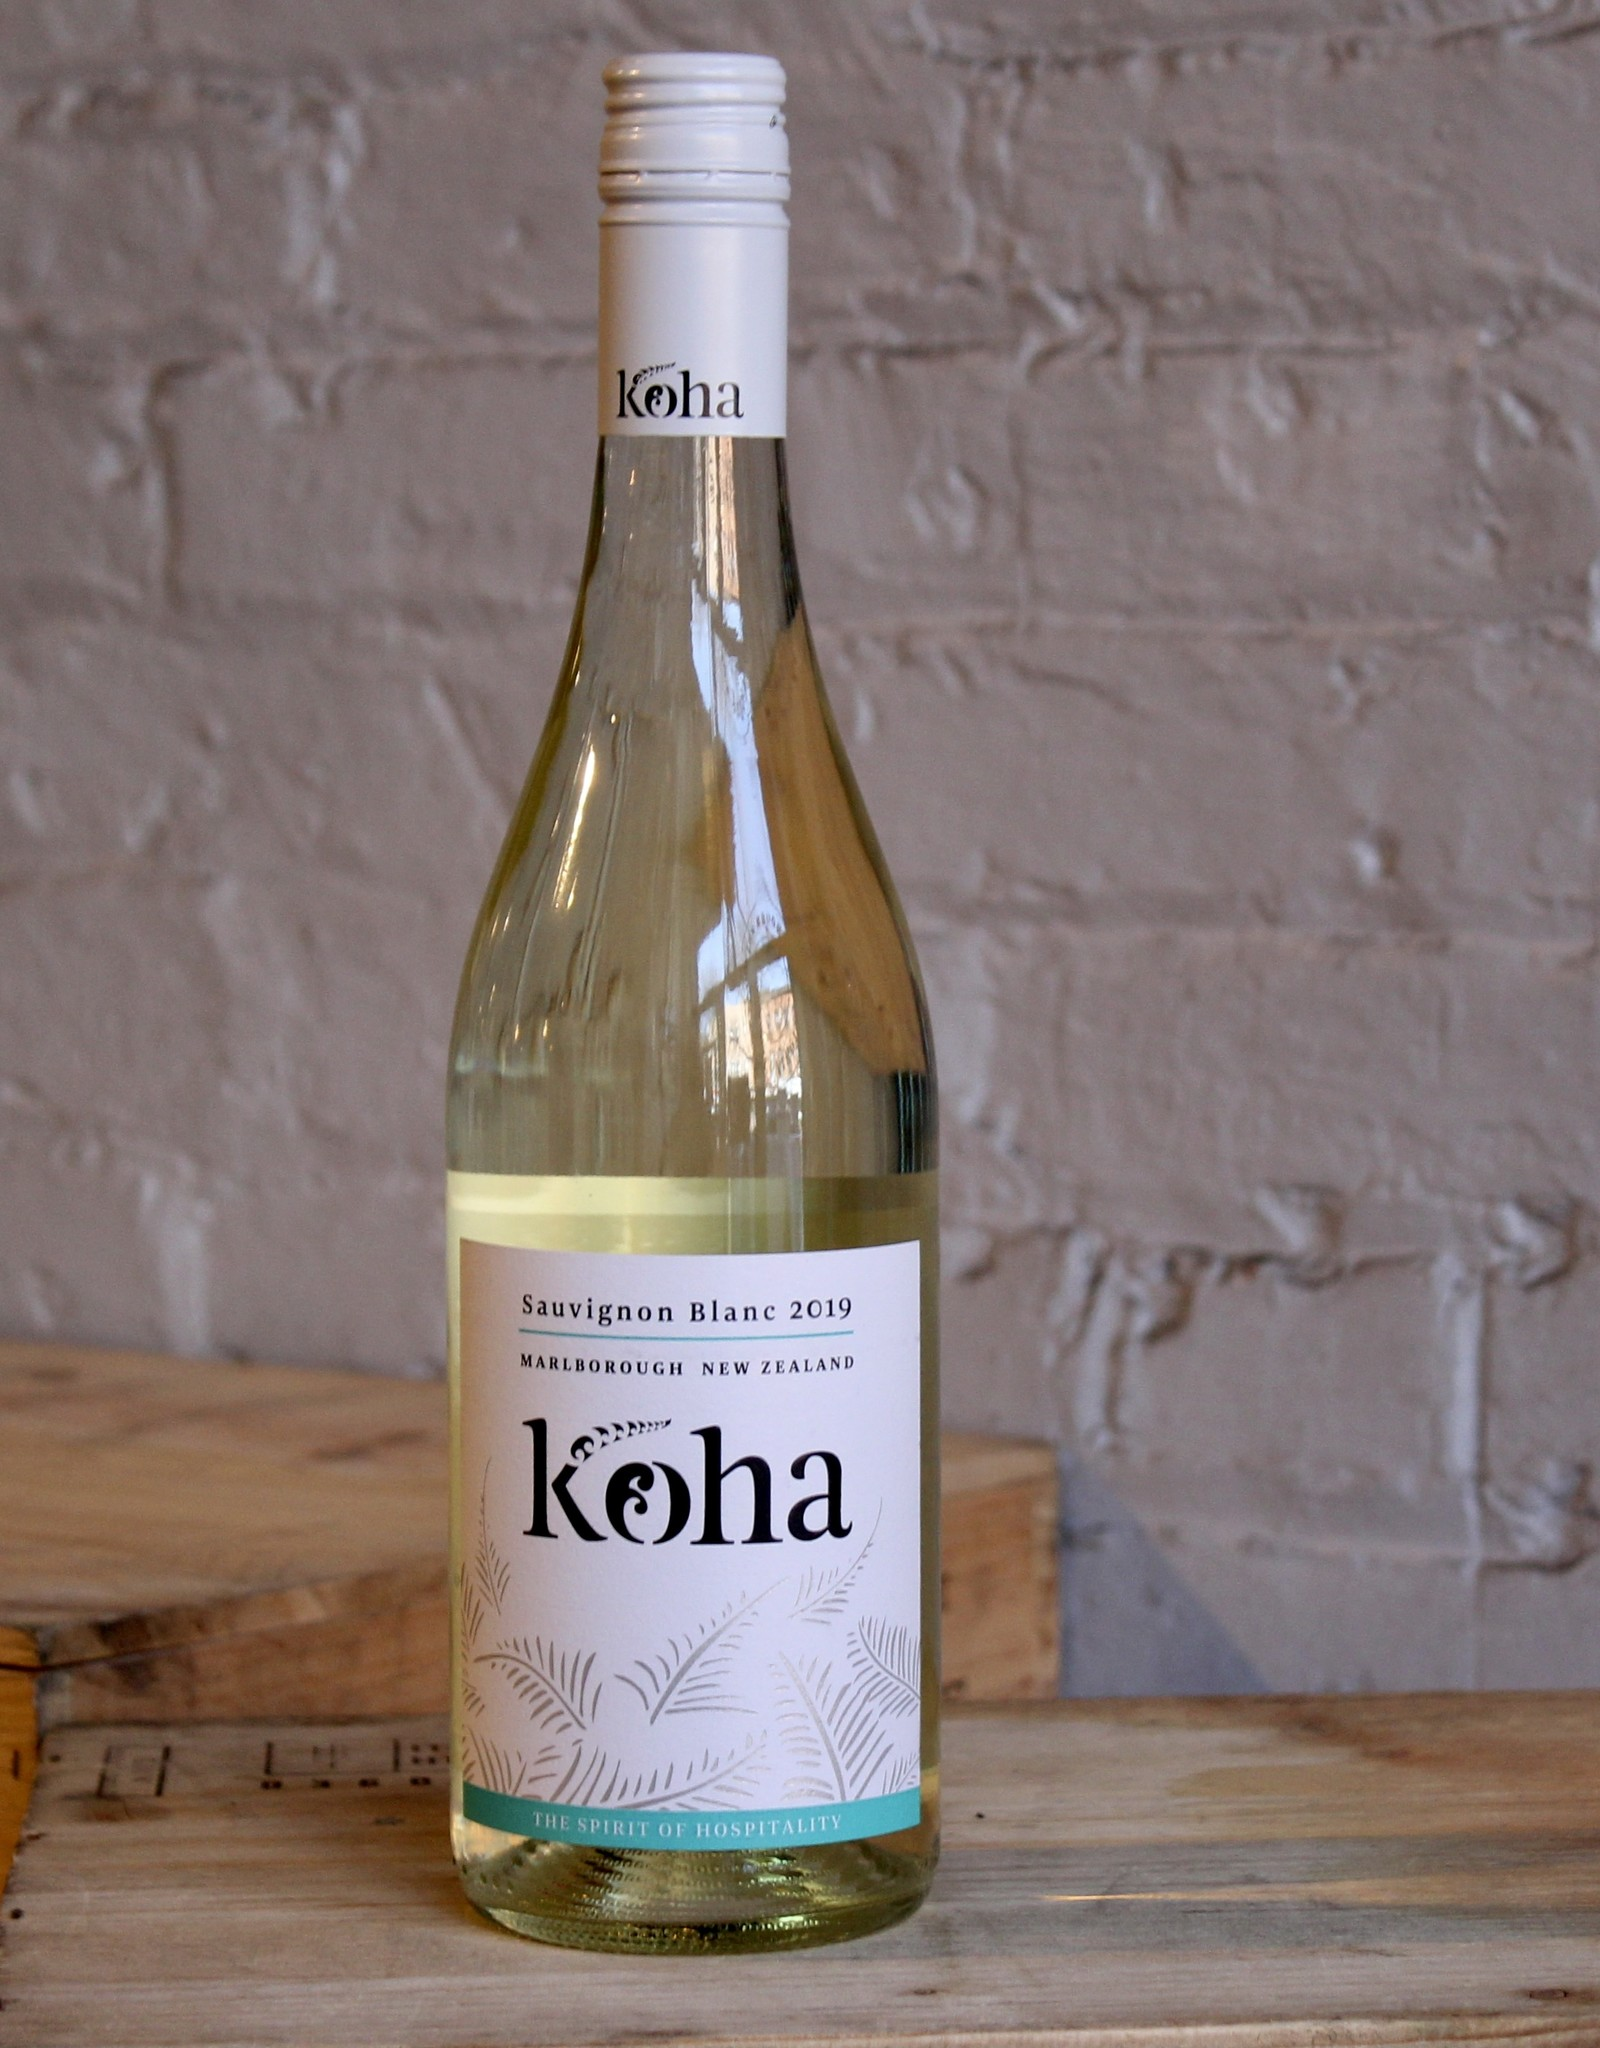 Wine 2019 Koha Sauvignon Blanc - Marlborough, New Zealand (750ml)